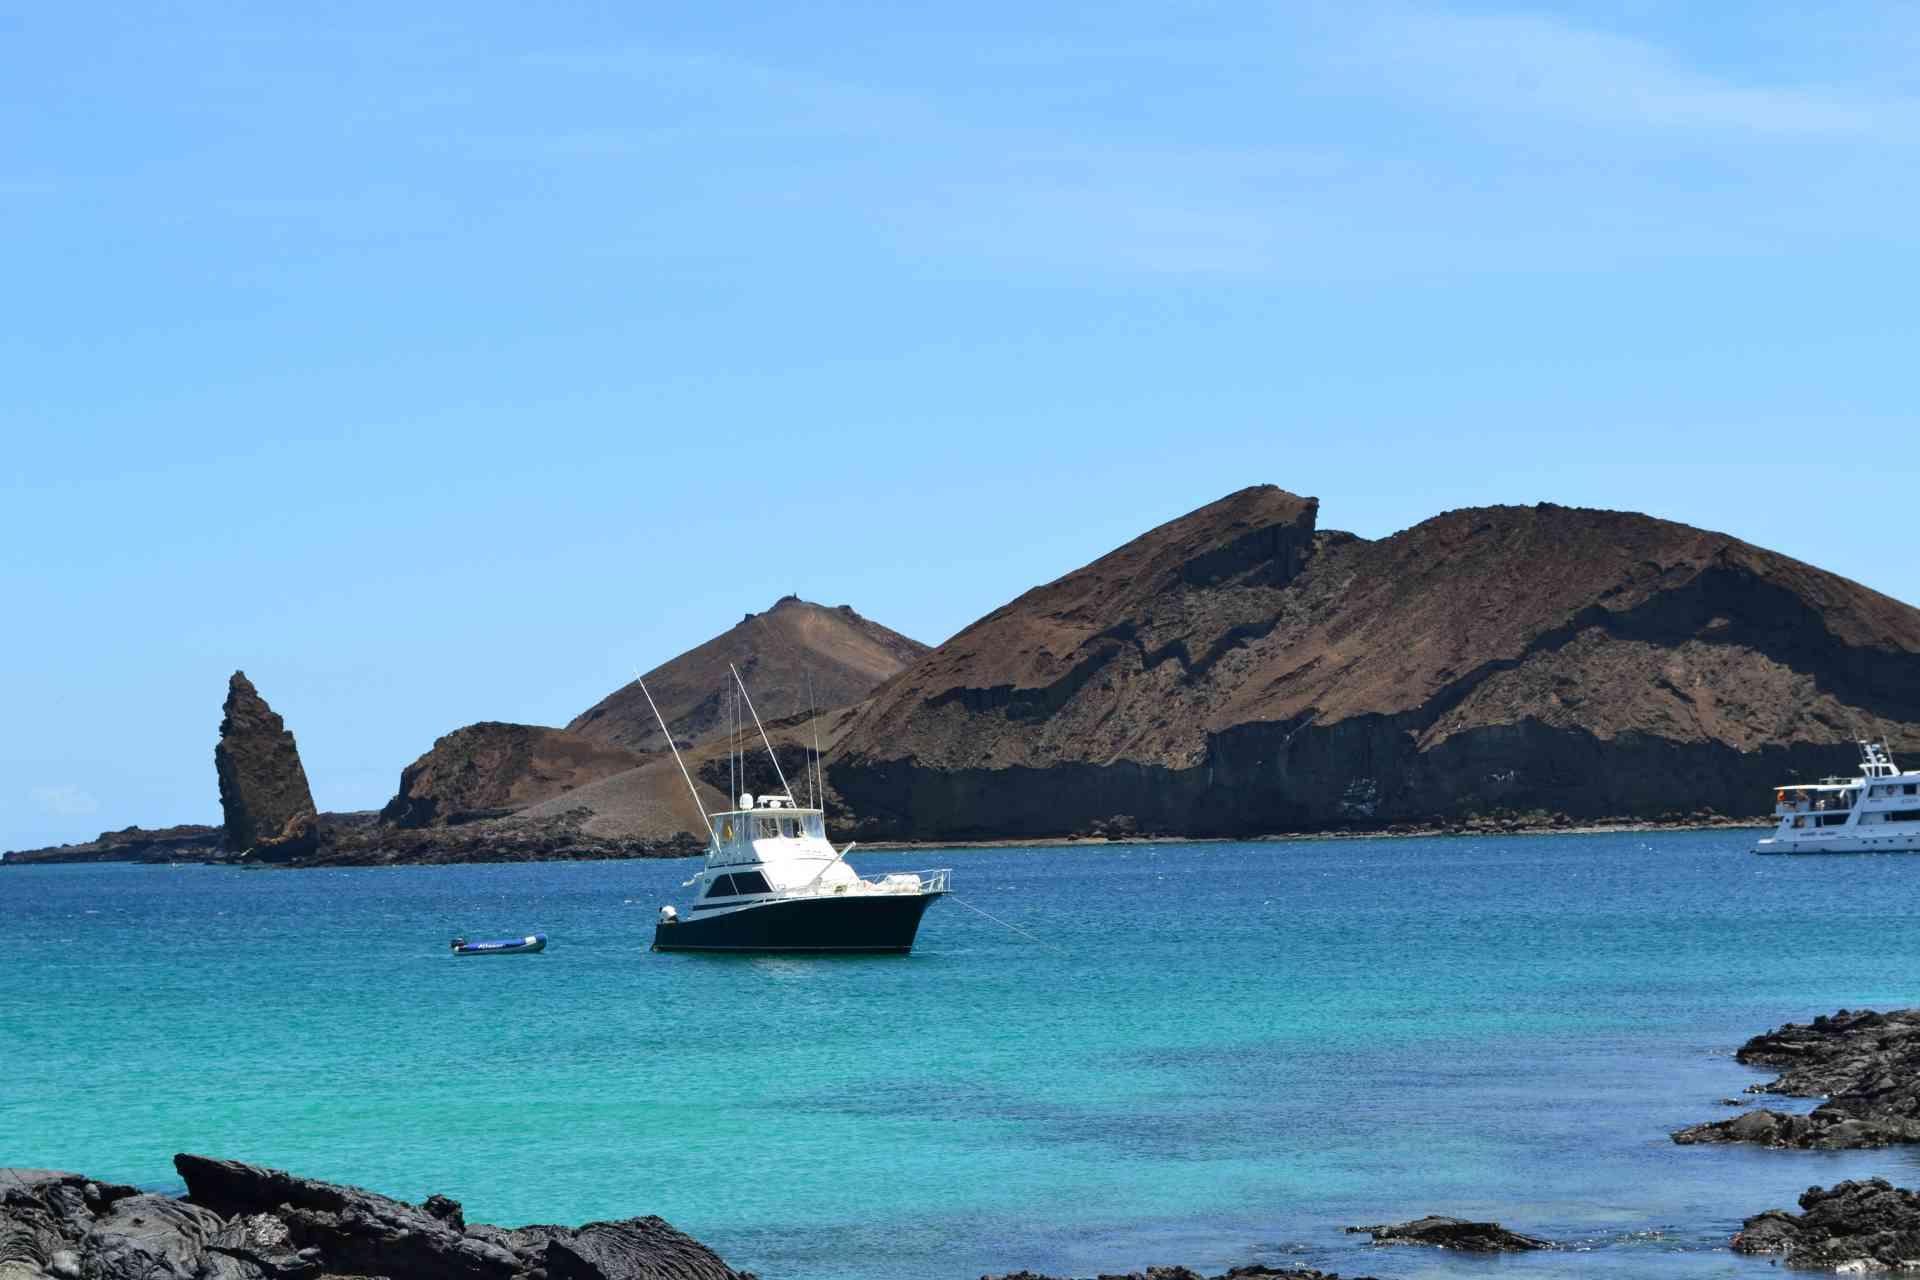 Pinnacle Rock on Bartolome Island, Galapagos Islands, Ecuador by Natalia Borojovich